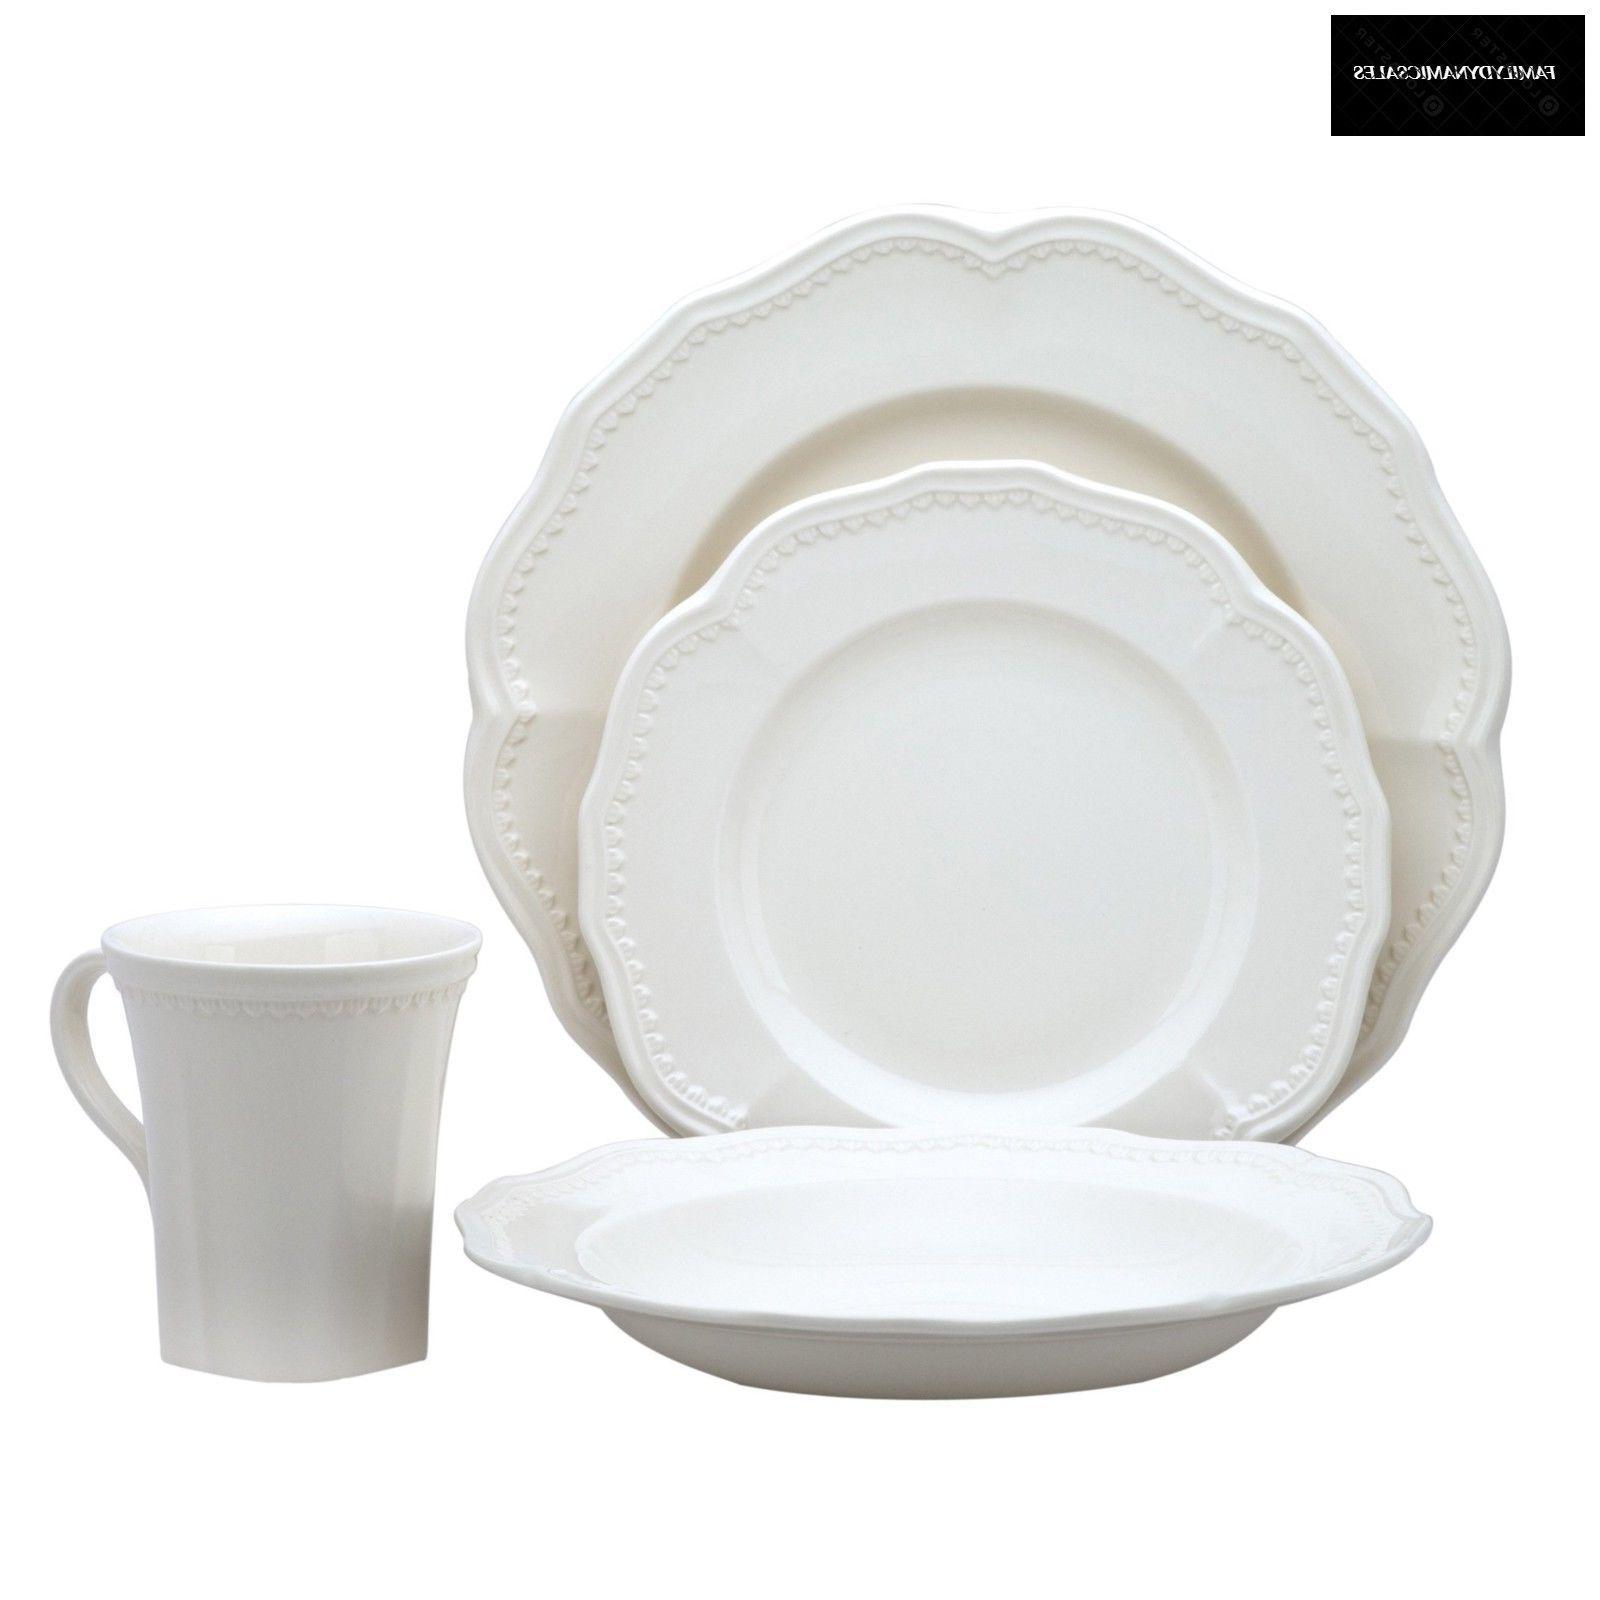 classic white 16 piece dining set kitchen